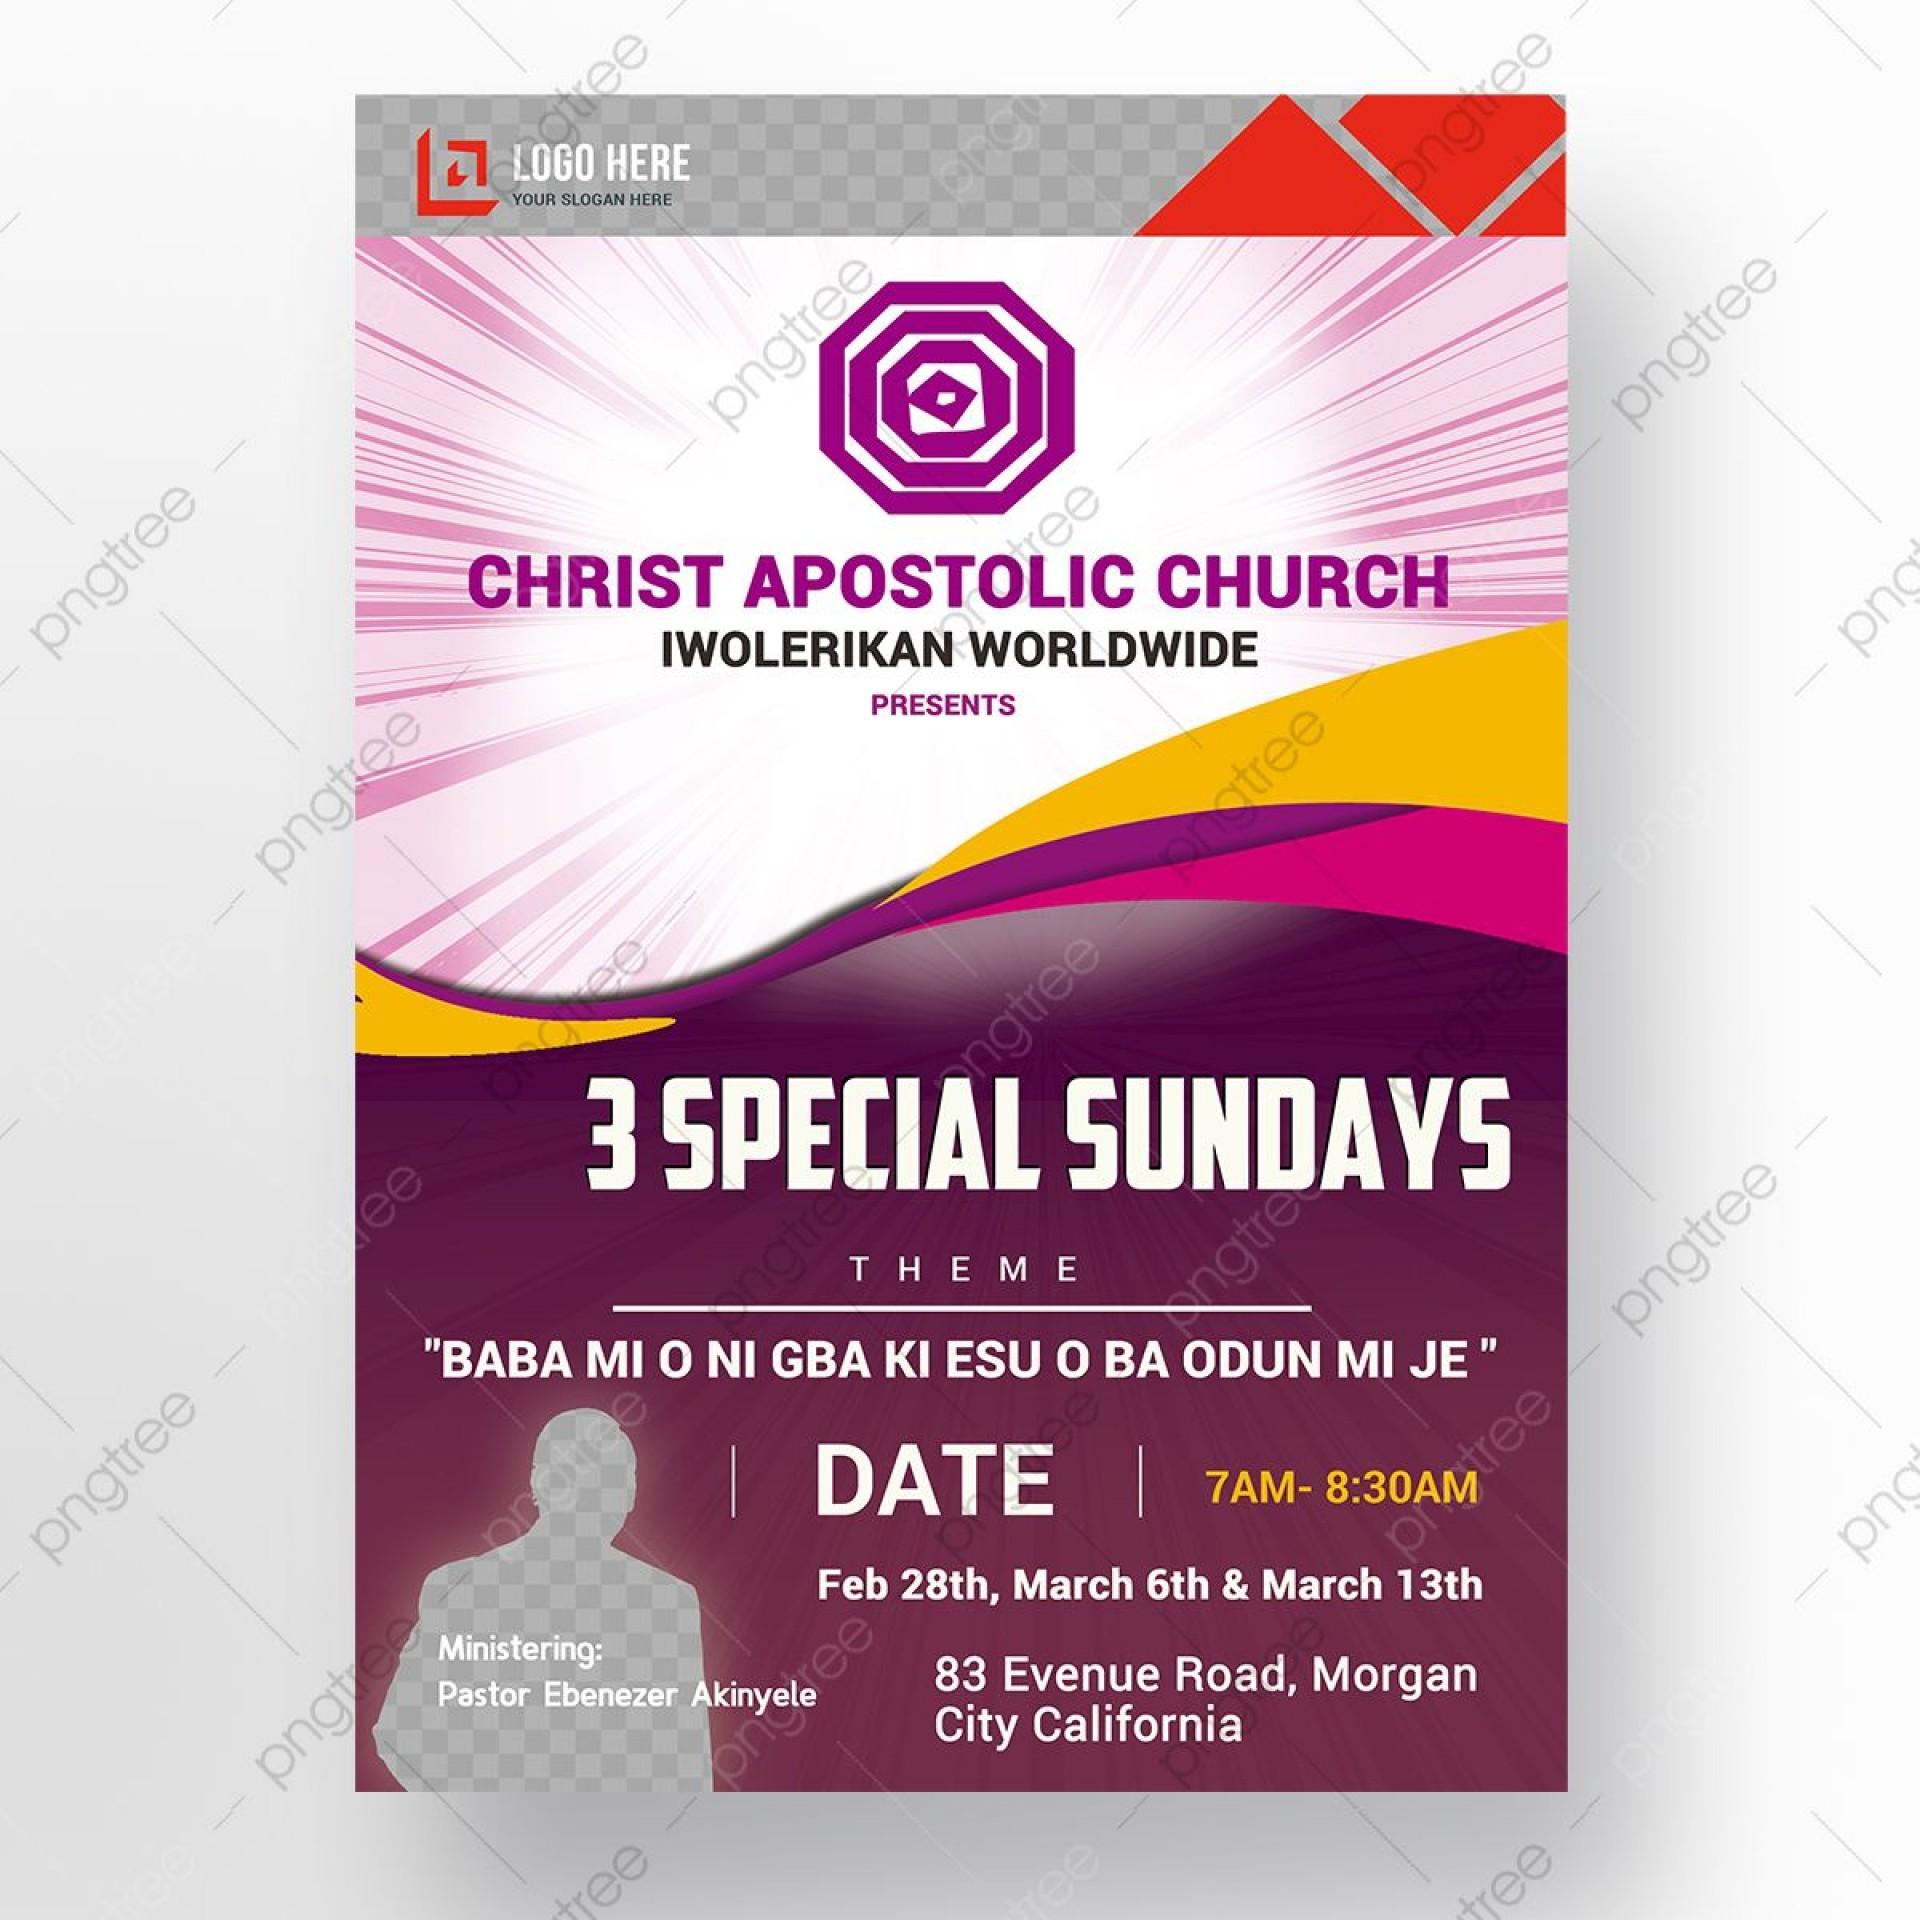 008 Fantastic Free Sunday School Flyer Template High Def  Templates1920